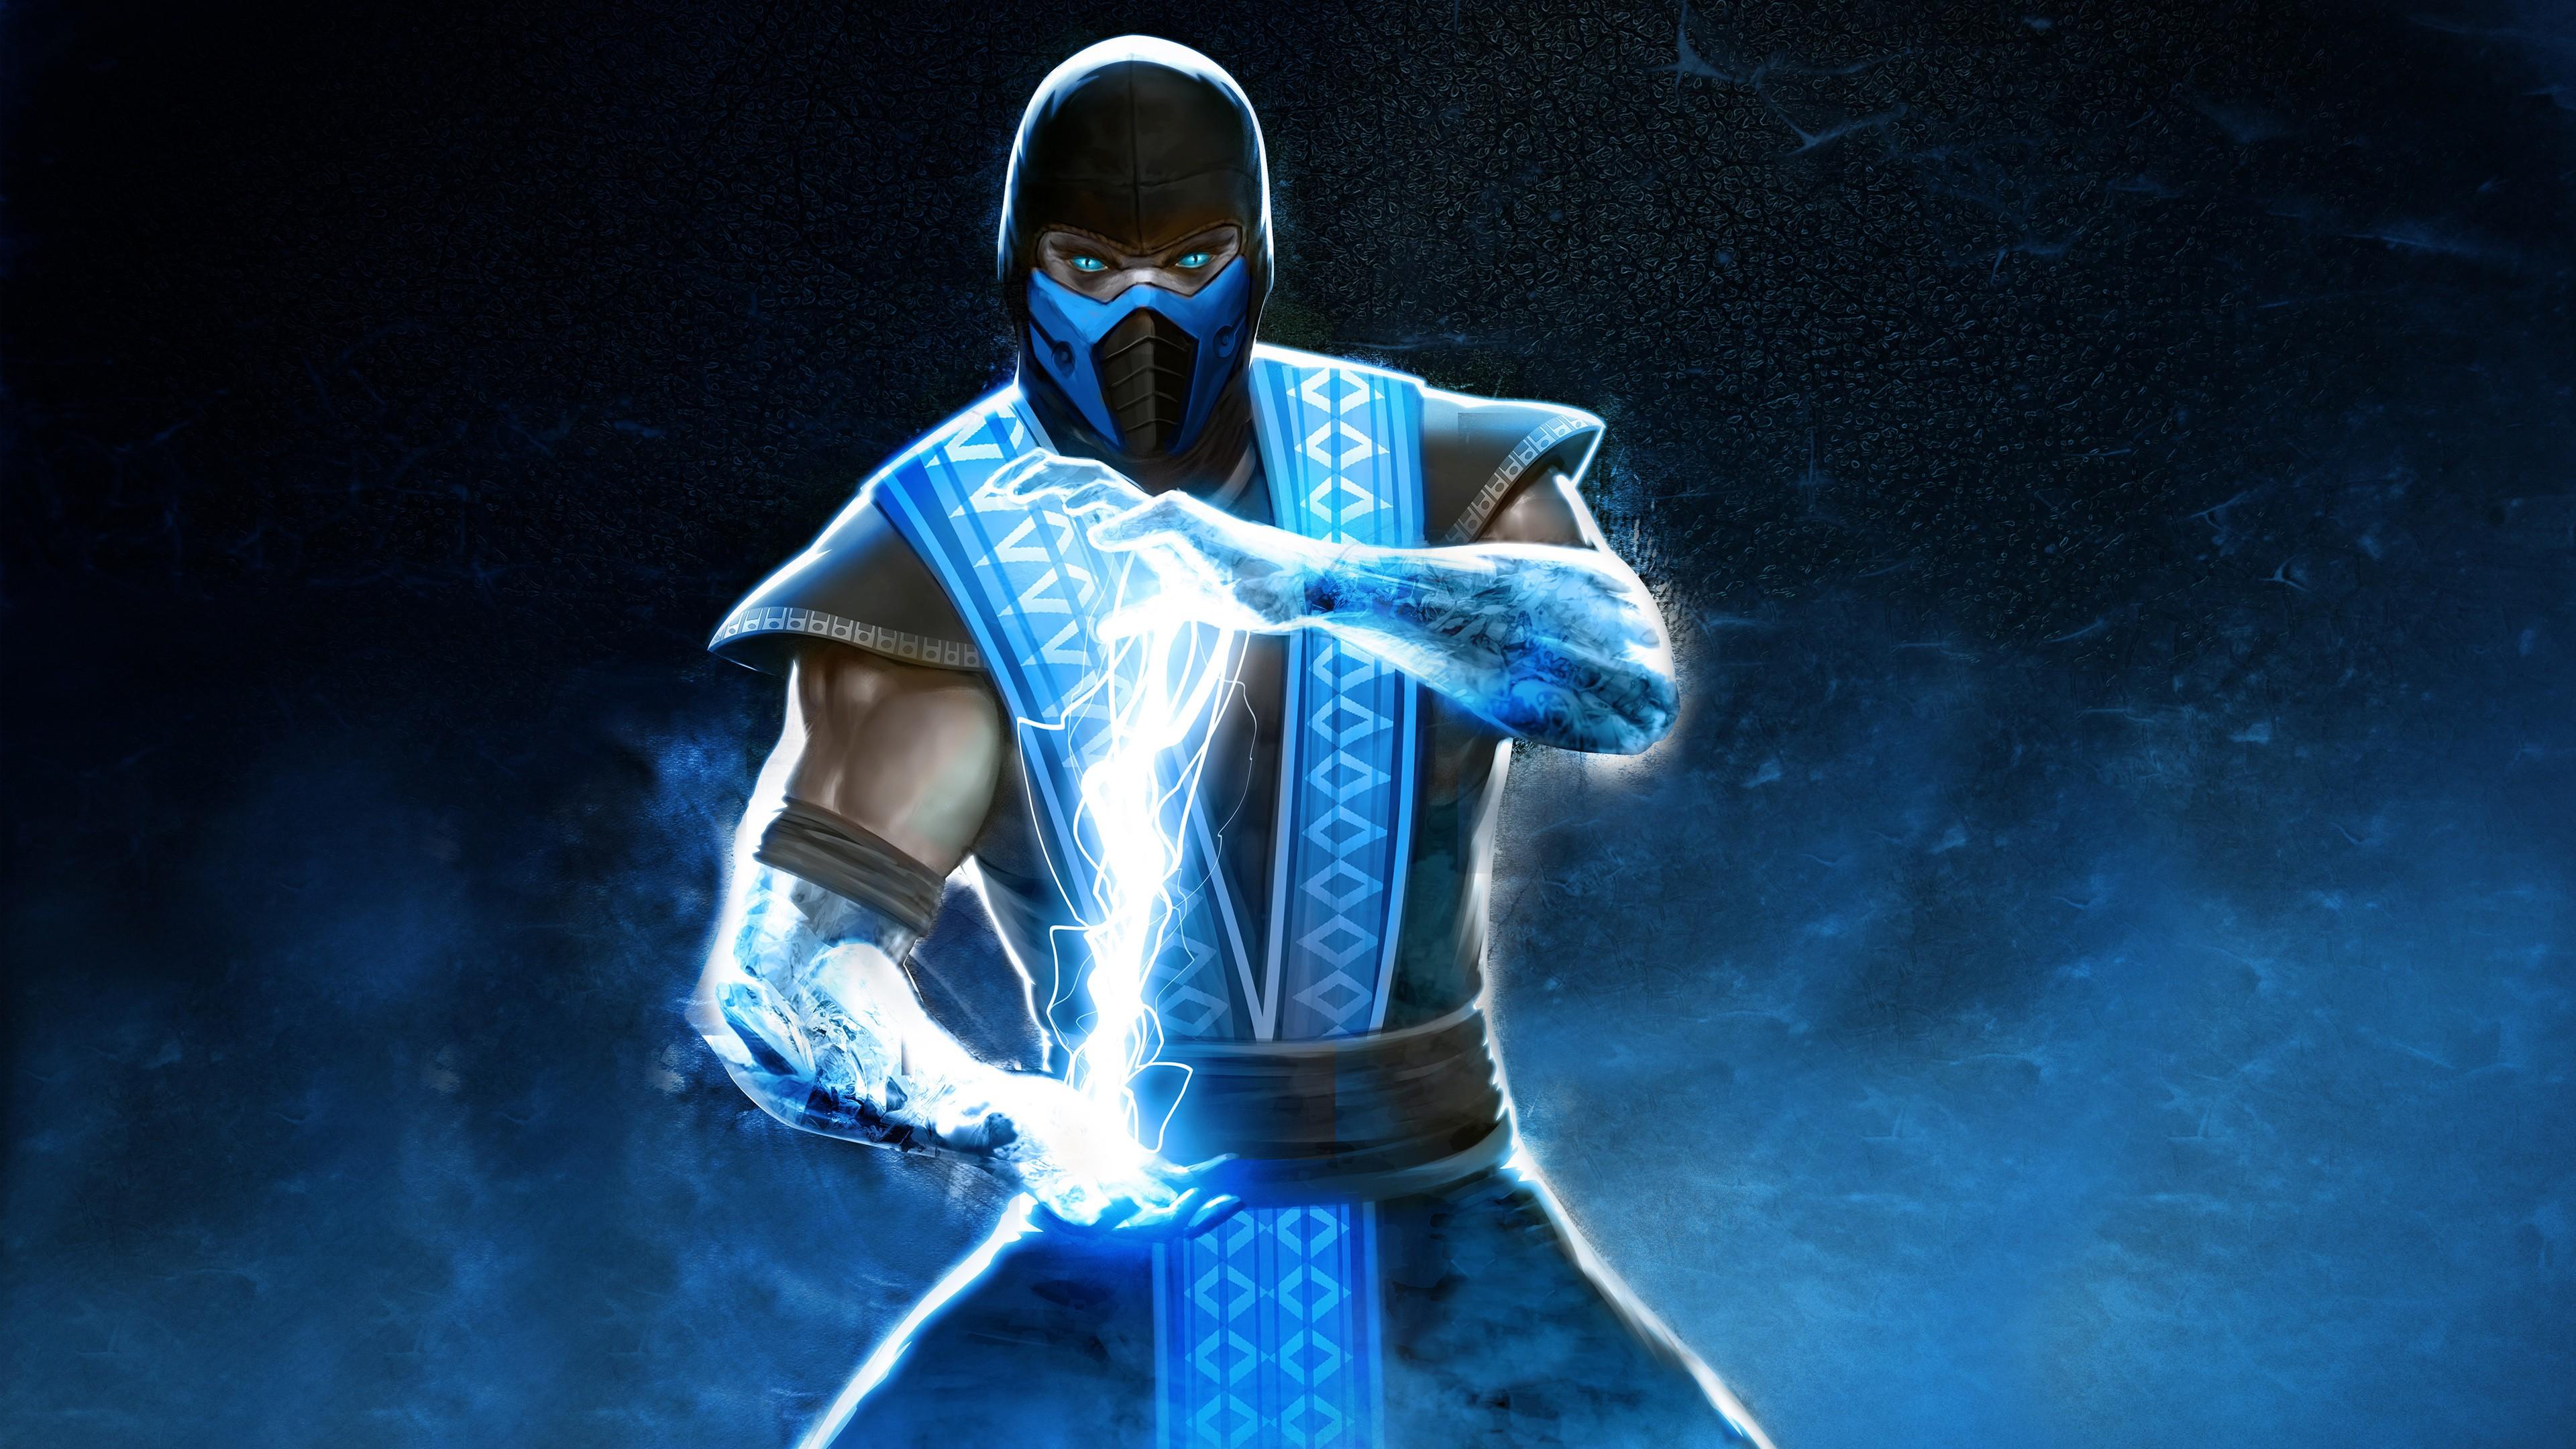 Sub Zero In Mortal Kombat 4k Hd Games 4k Wallpapers Images